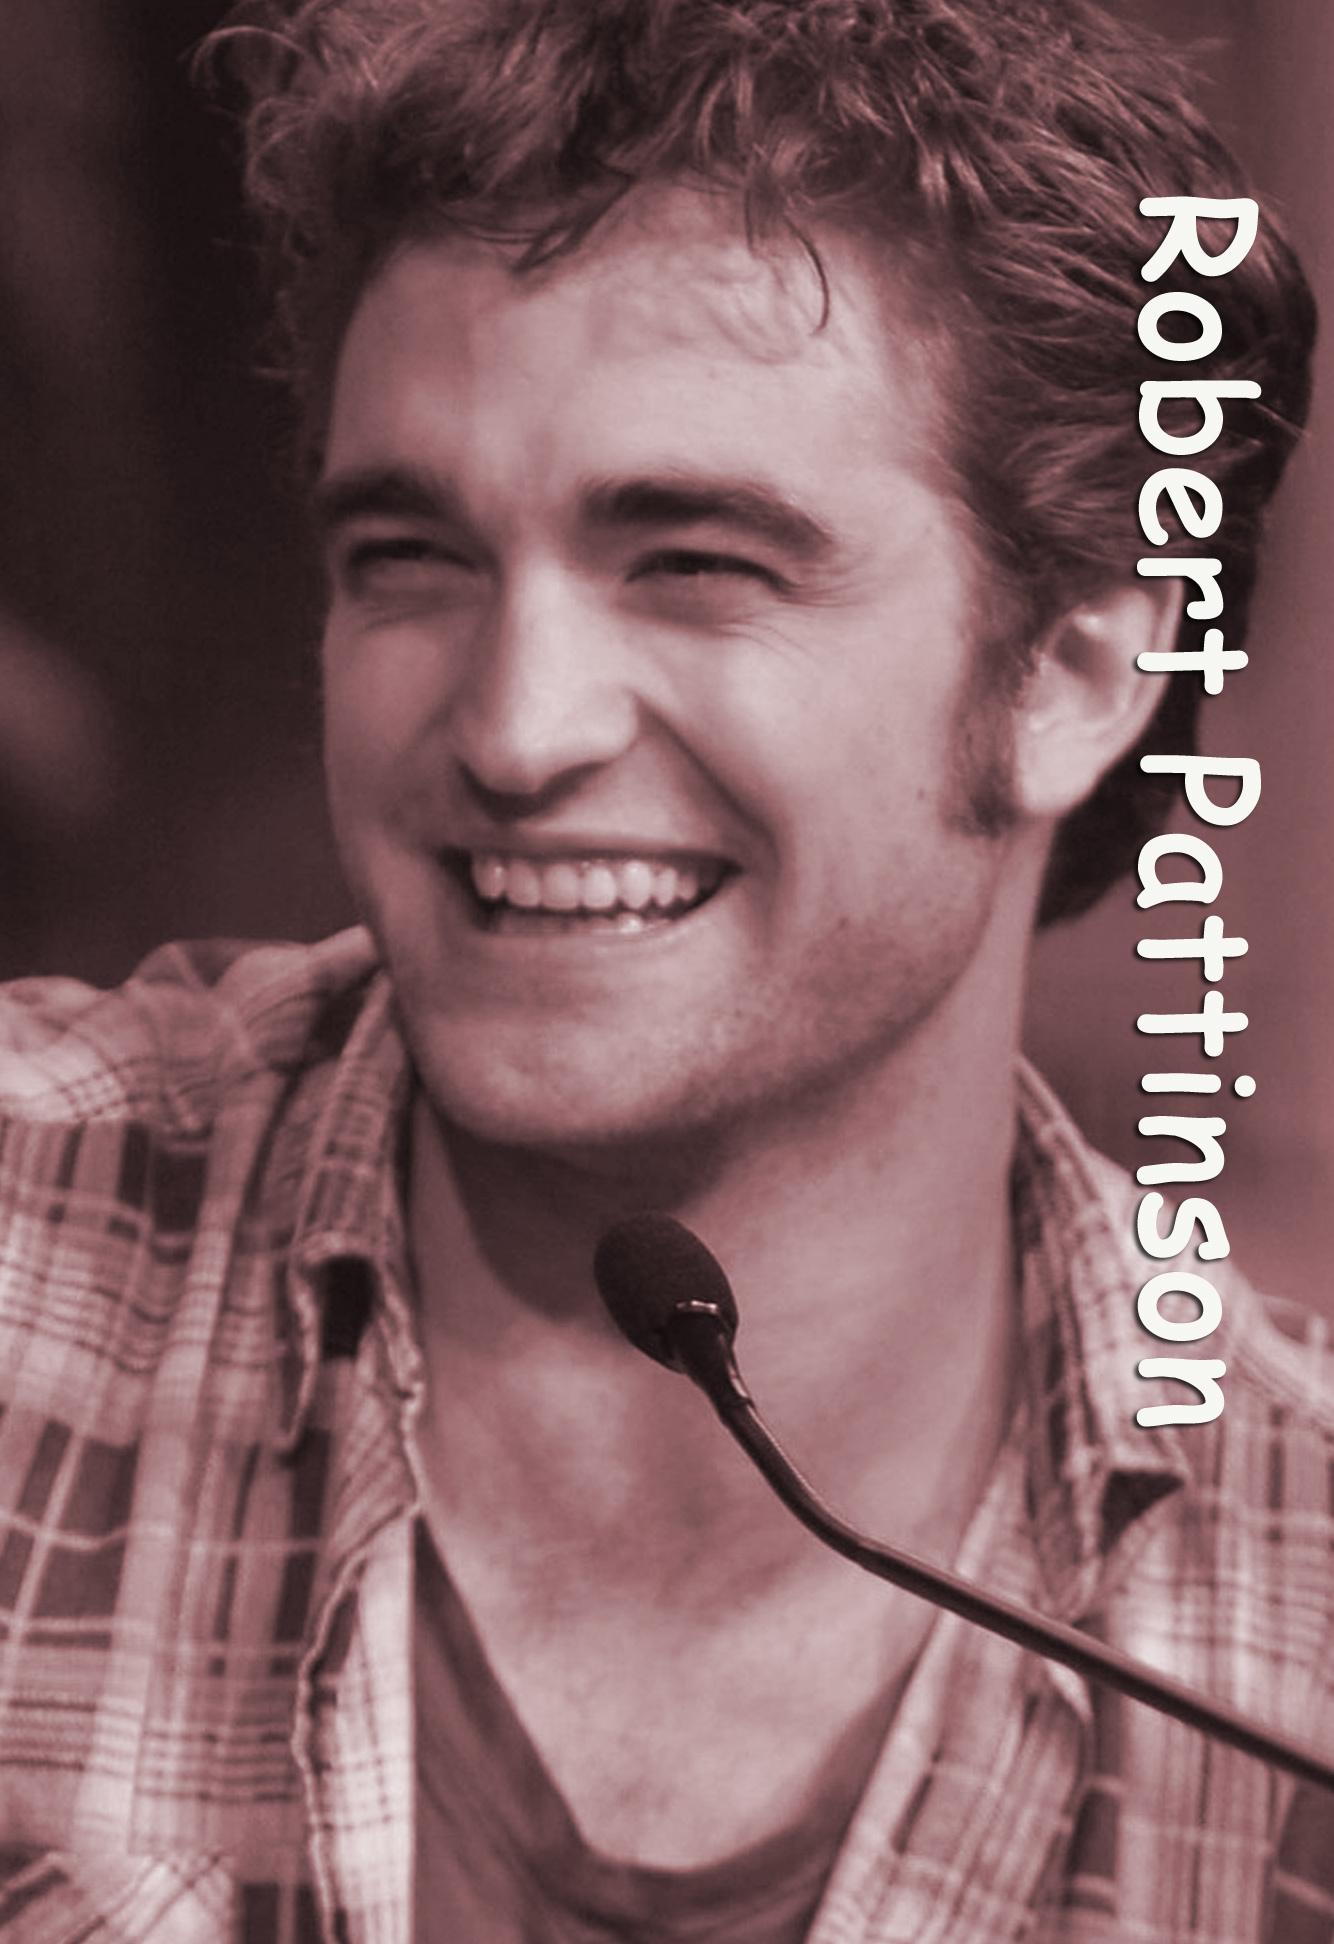 robert pattinson - i was boring so i made this =)